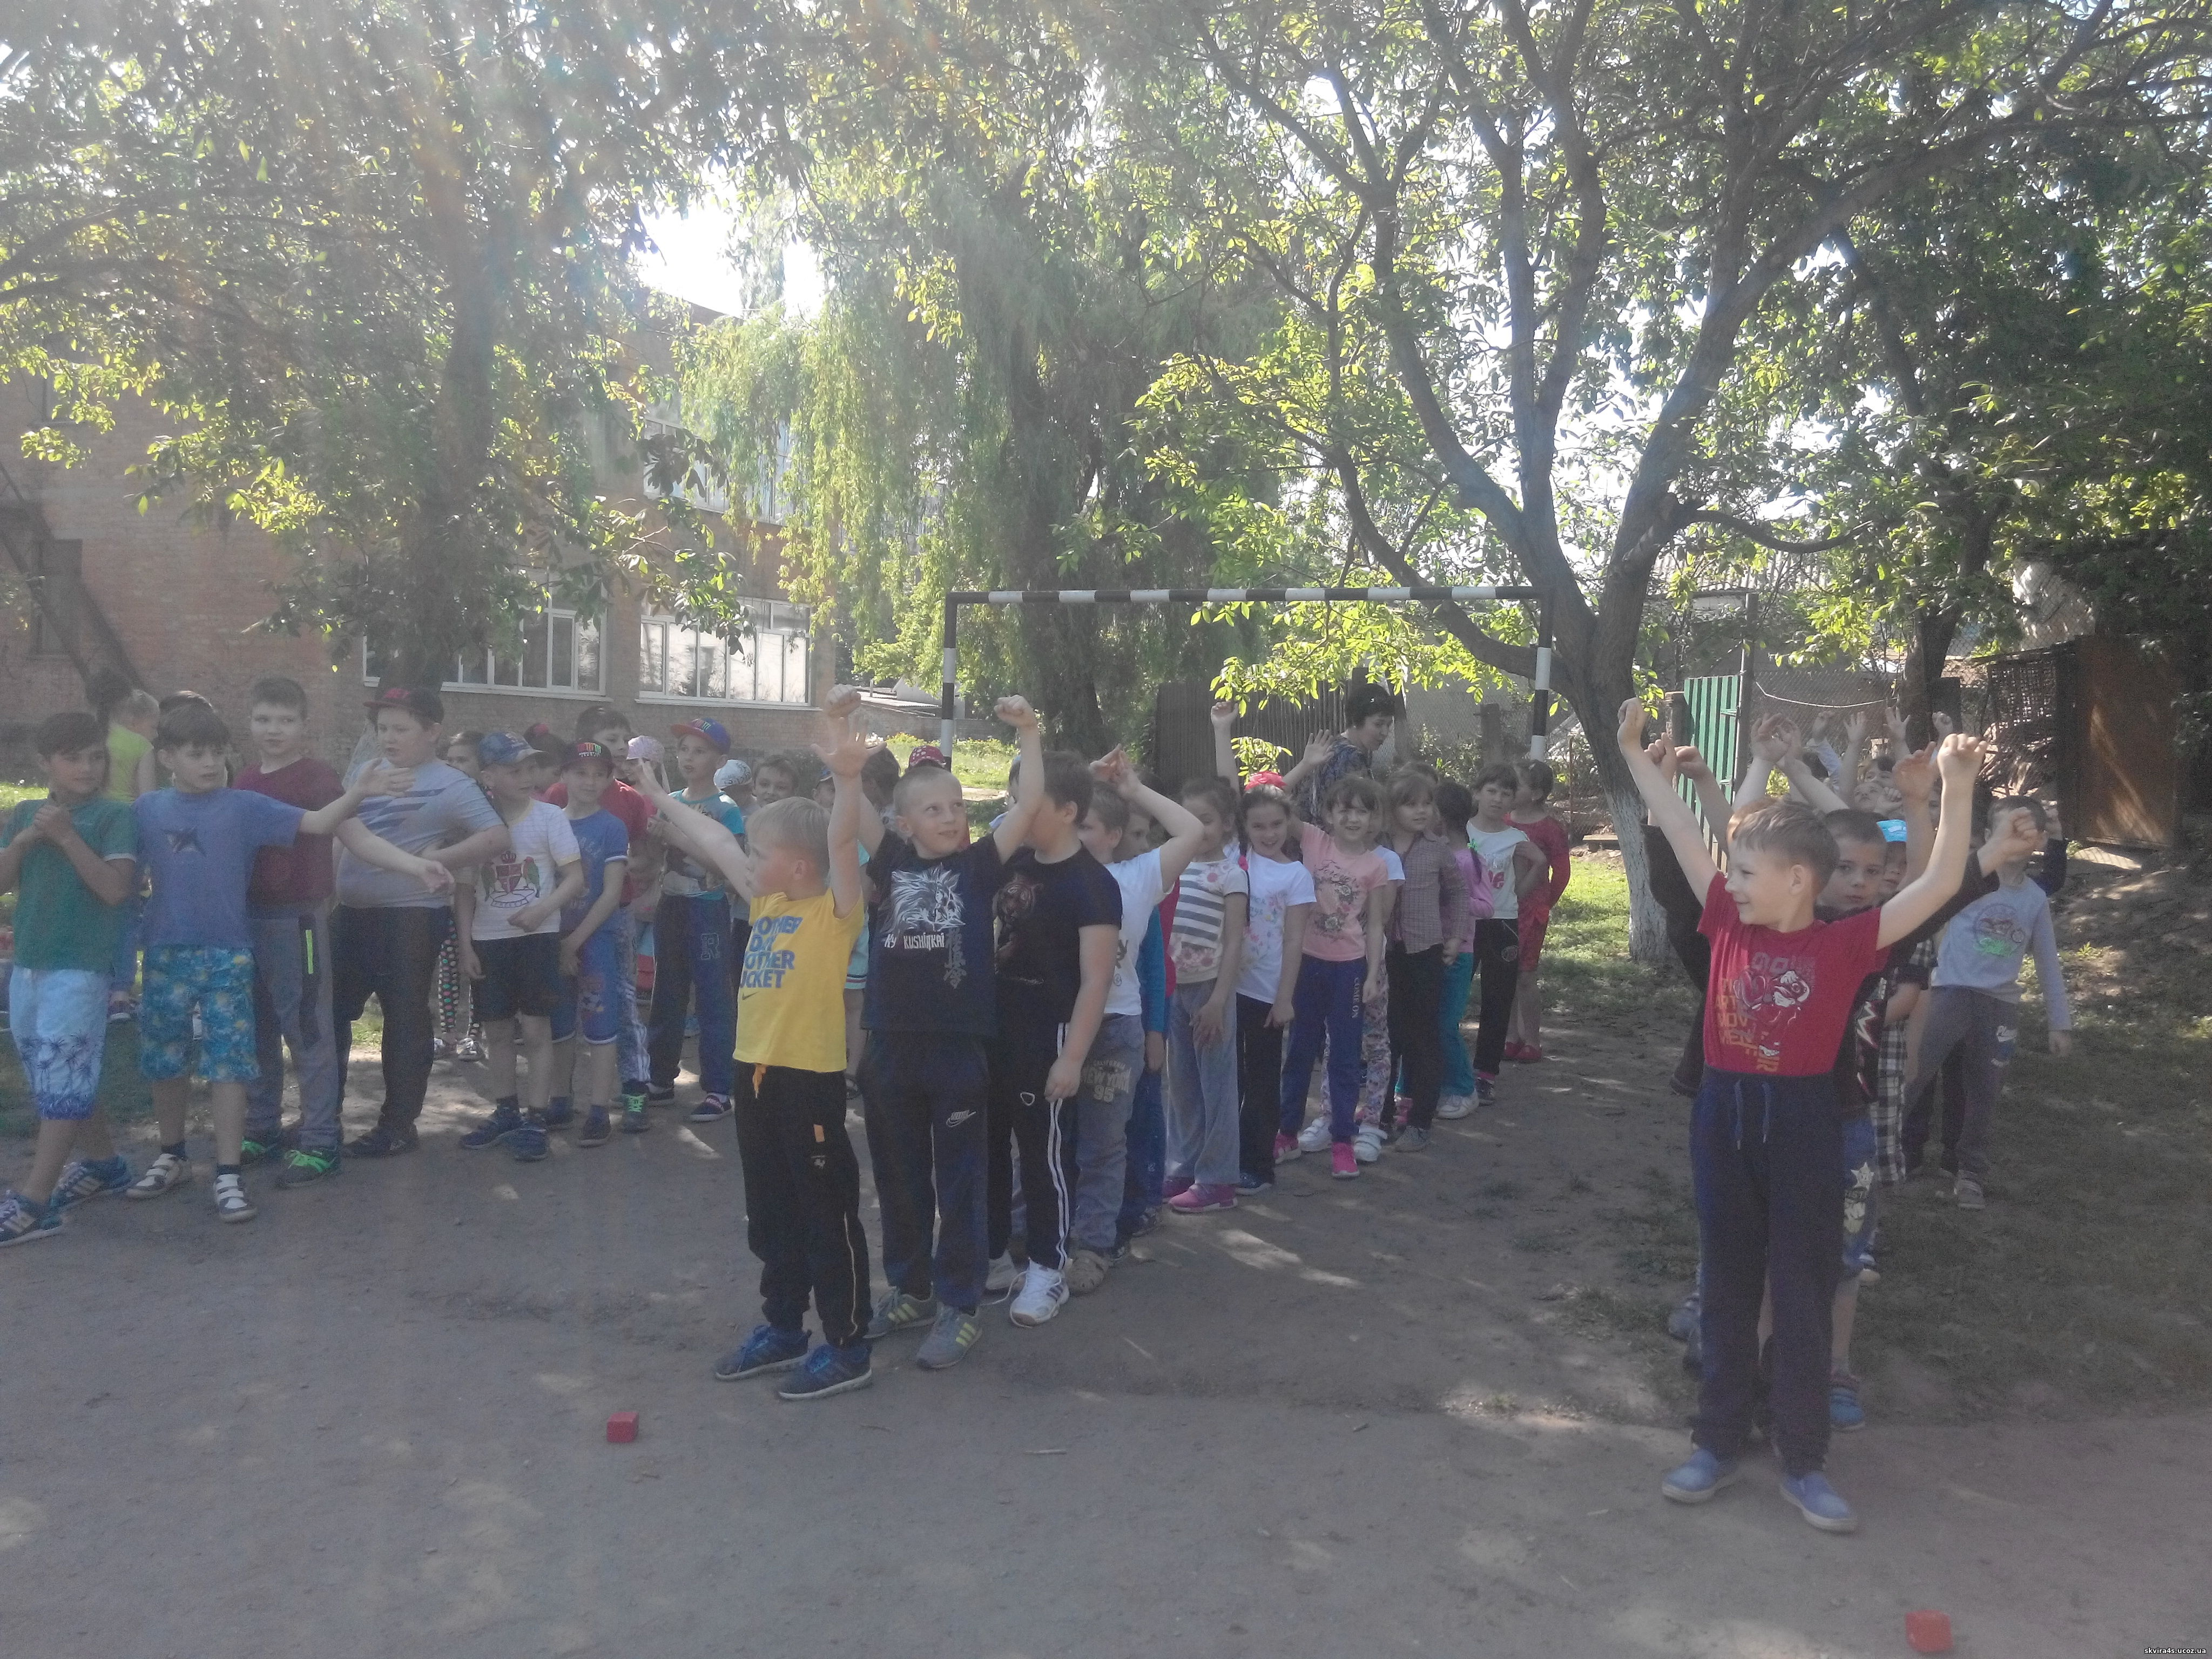 http://skvira4s.ucoz.ua/foto/24-05-17-1/2017524095301.jpg